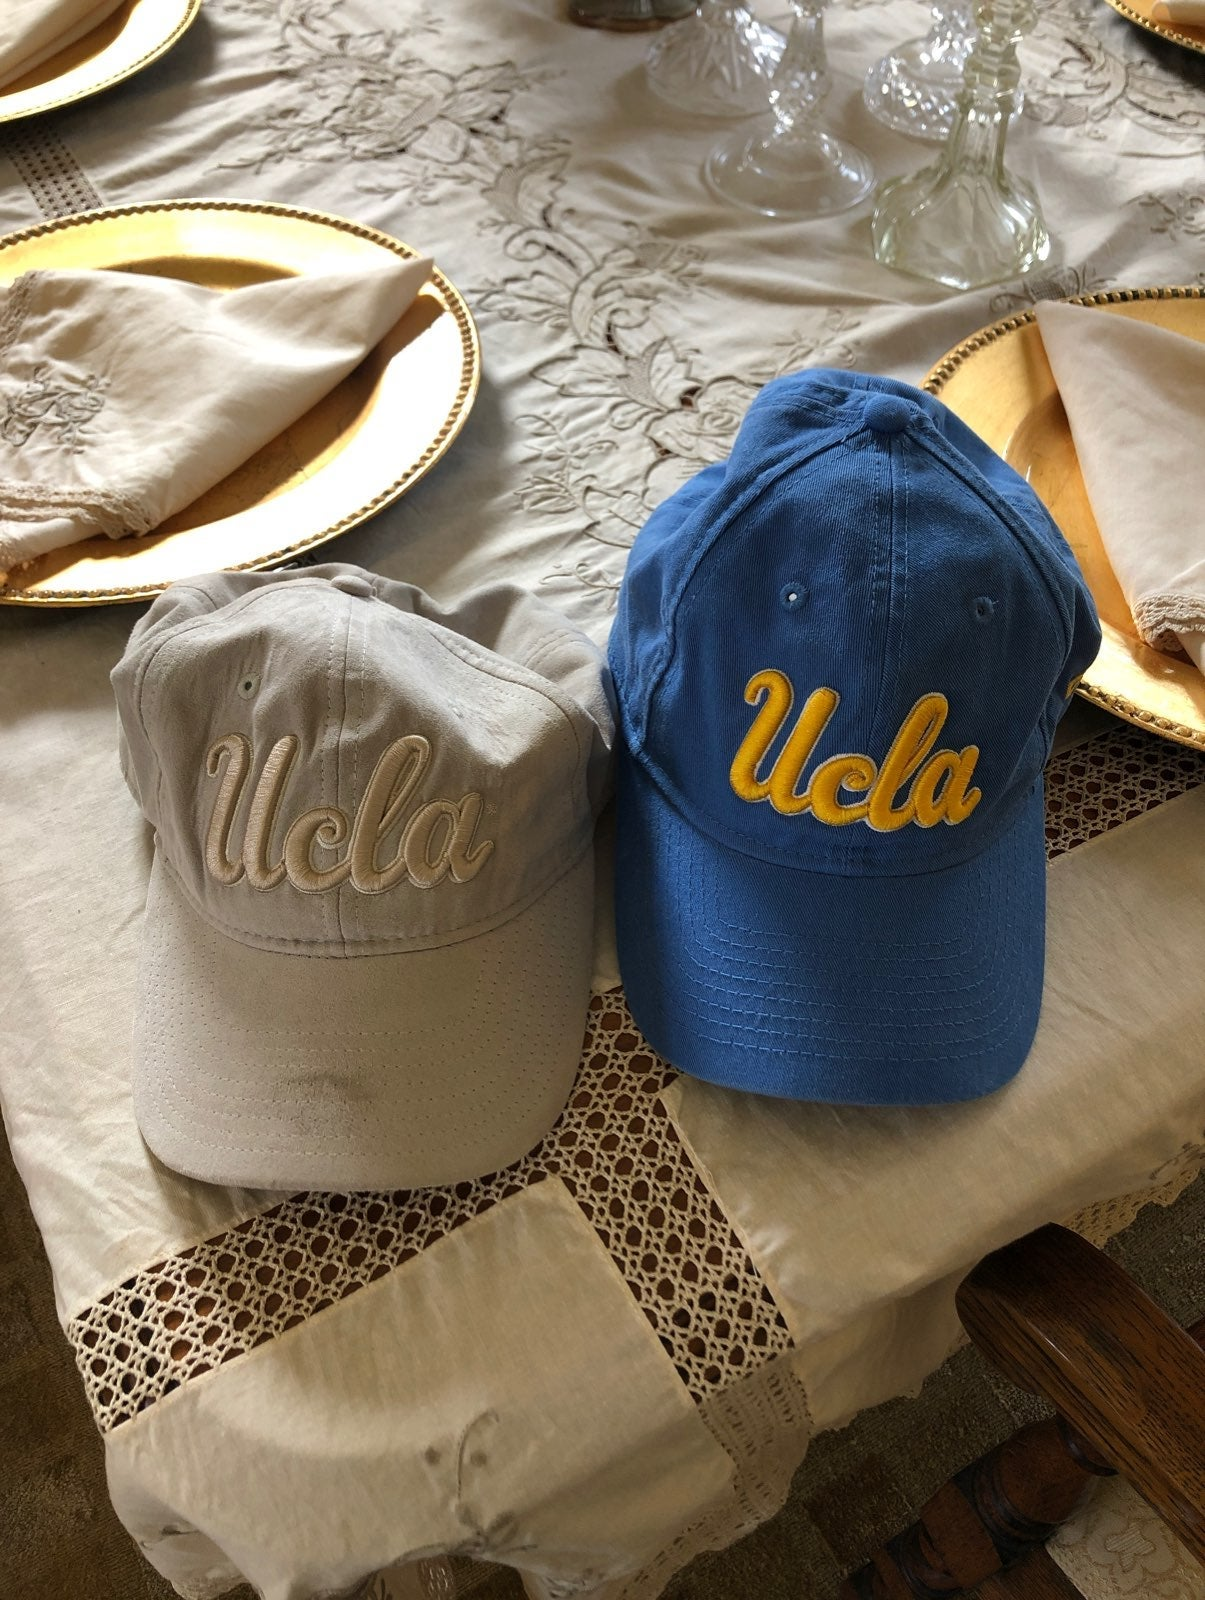 Ucla ball caps